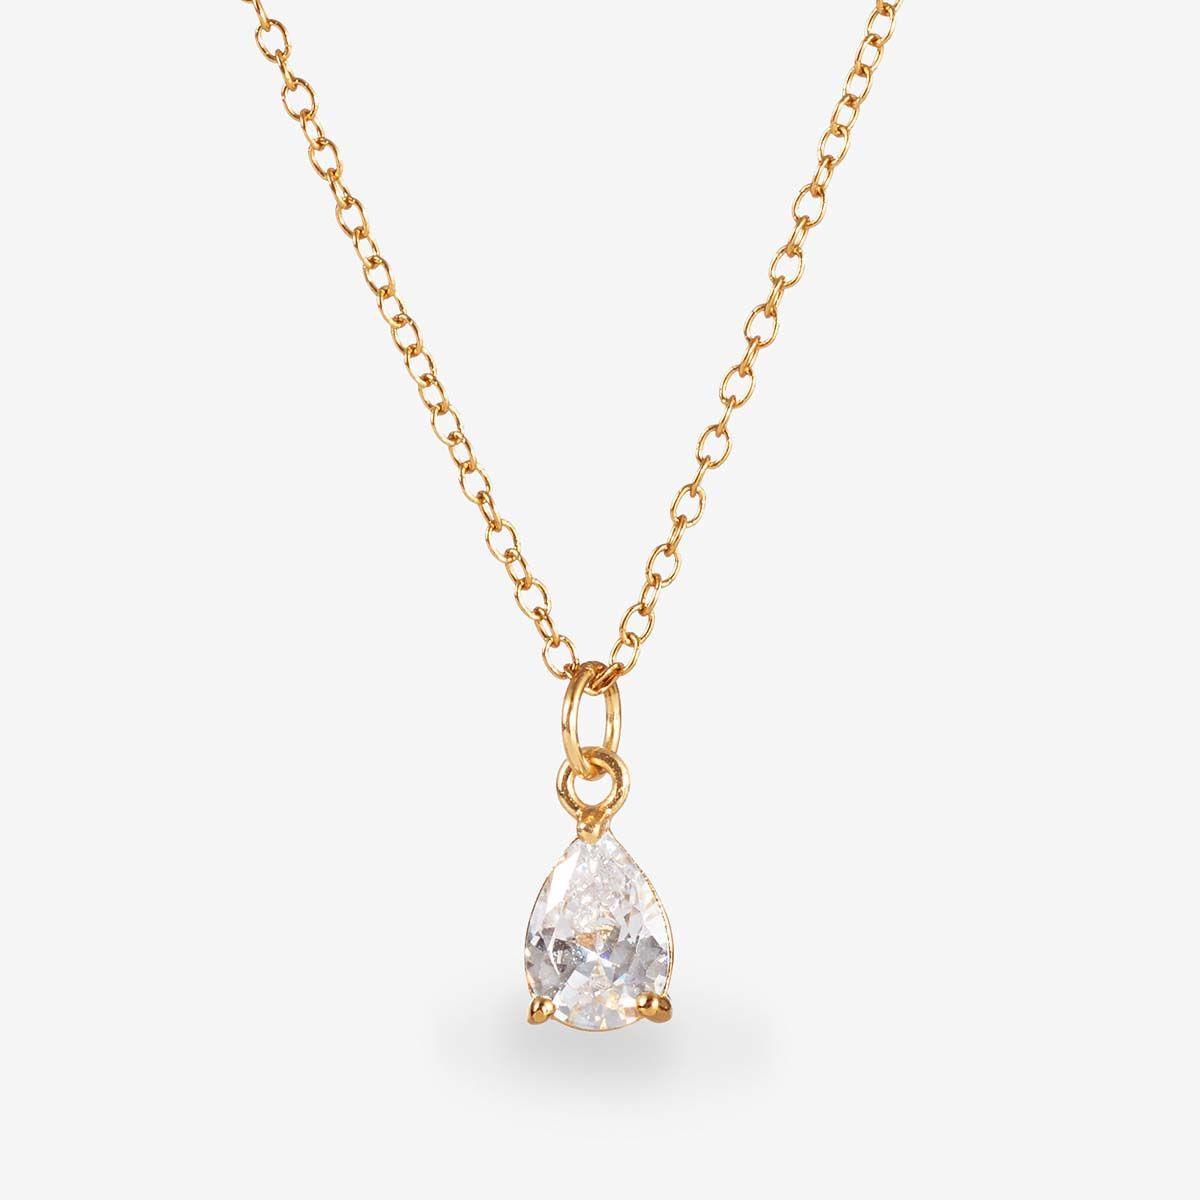 Debora - Halsketten - 18k vergoldet